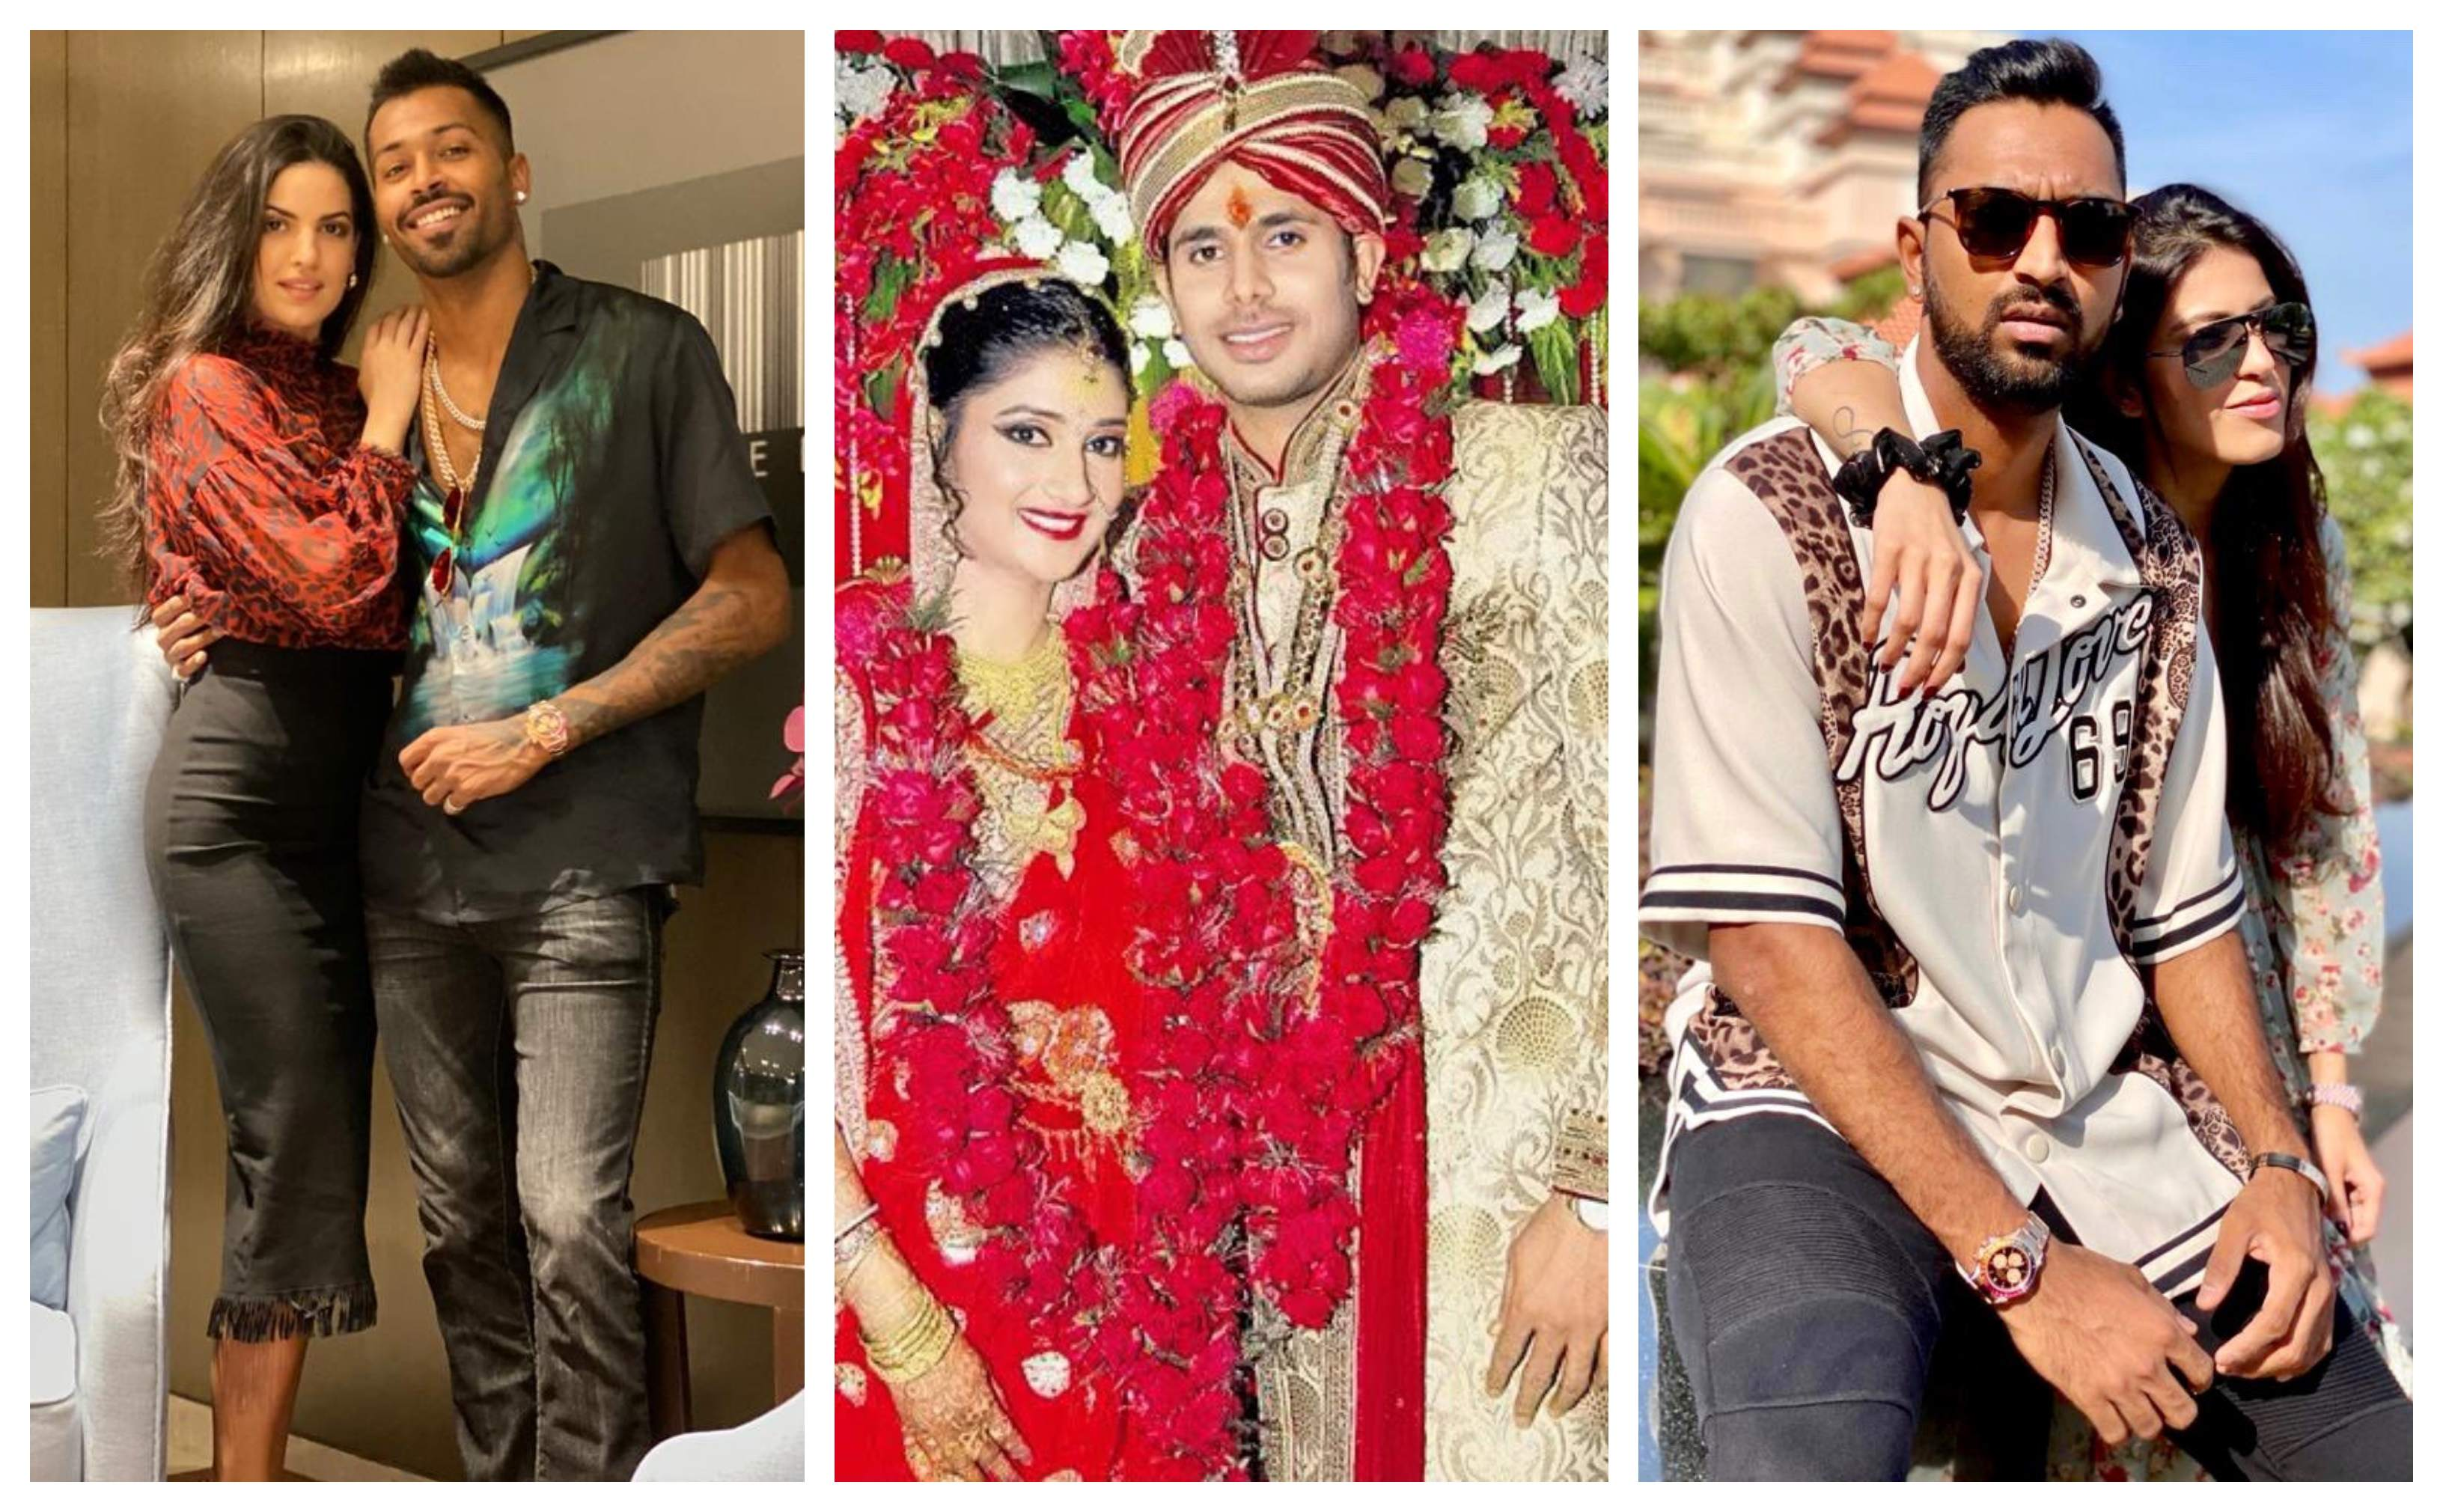 Hardik Pandya, Manoj Tiwary and Krunal Pandya with their wives | Getty